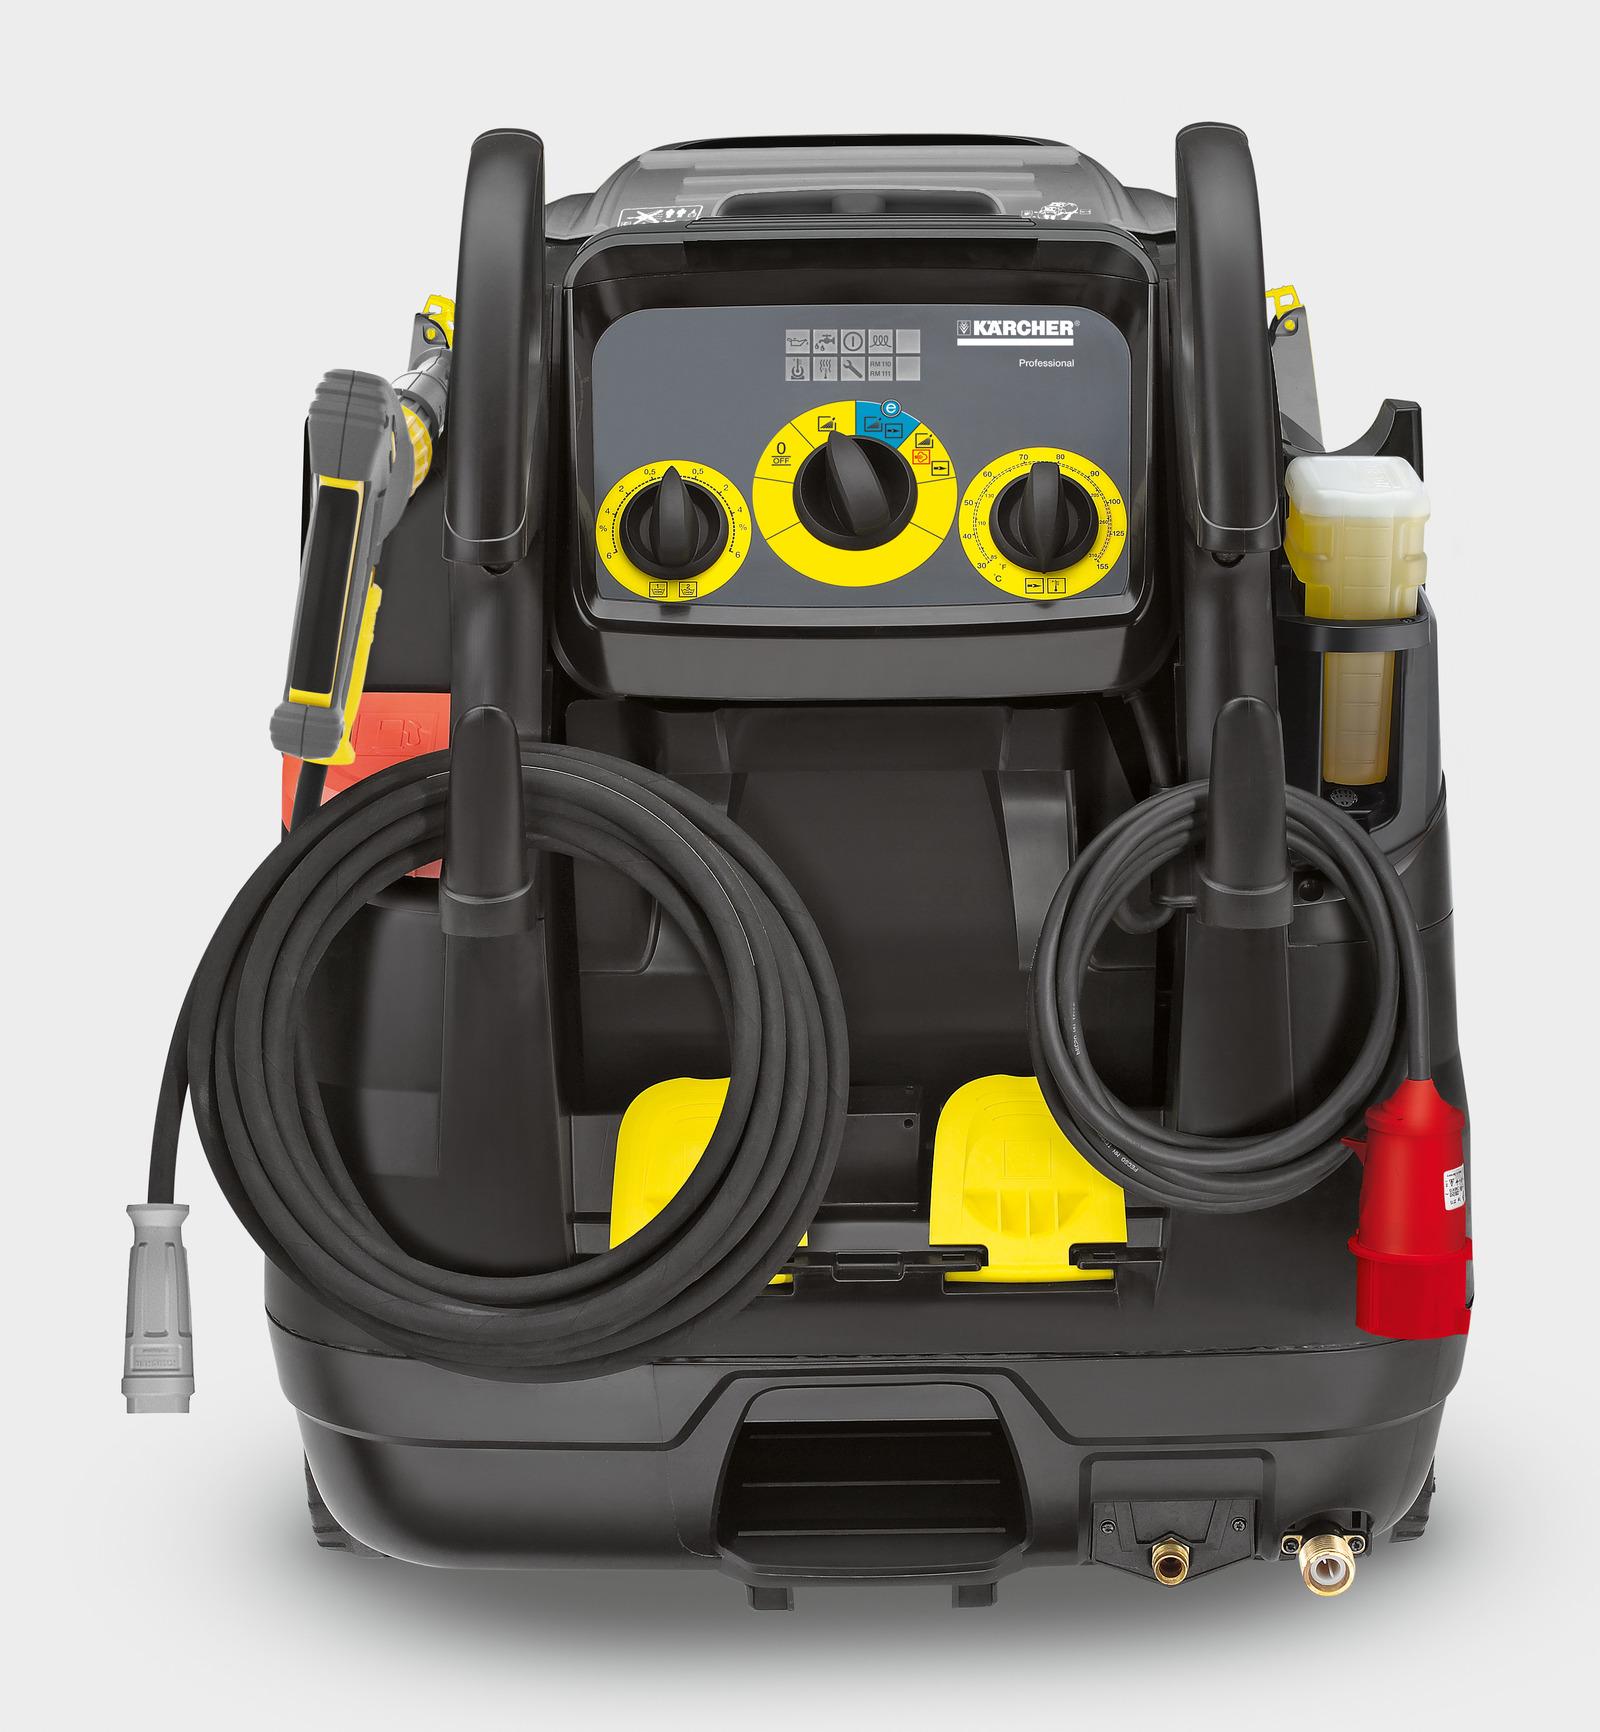 Hds 13 20 4 S Krcher International 3 Phase Electrical Wiring Diagram In Uae Order Number 1071 9270